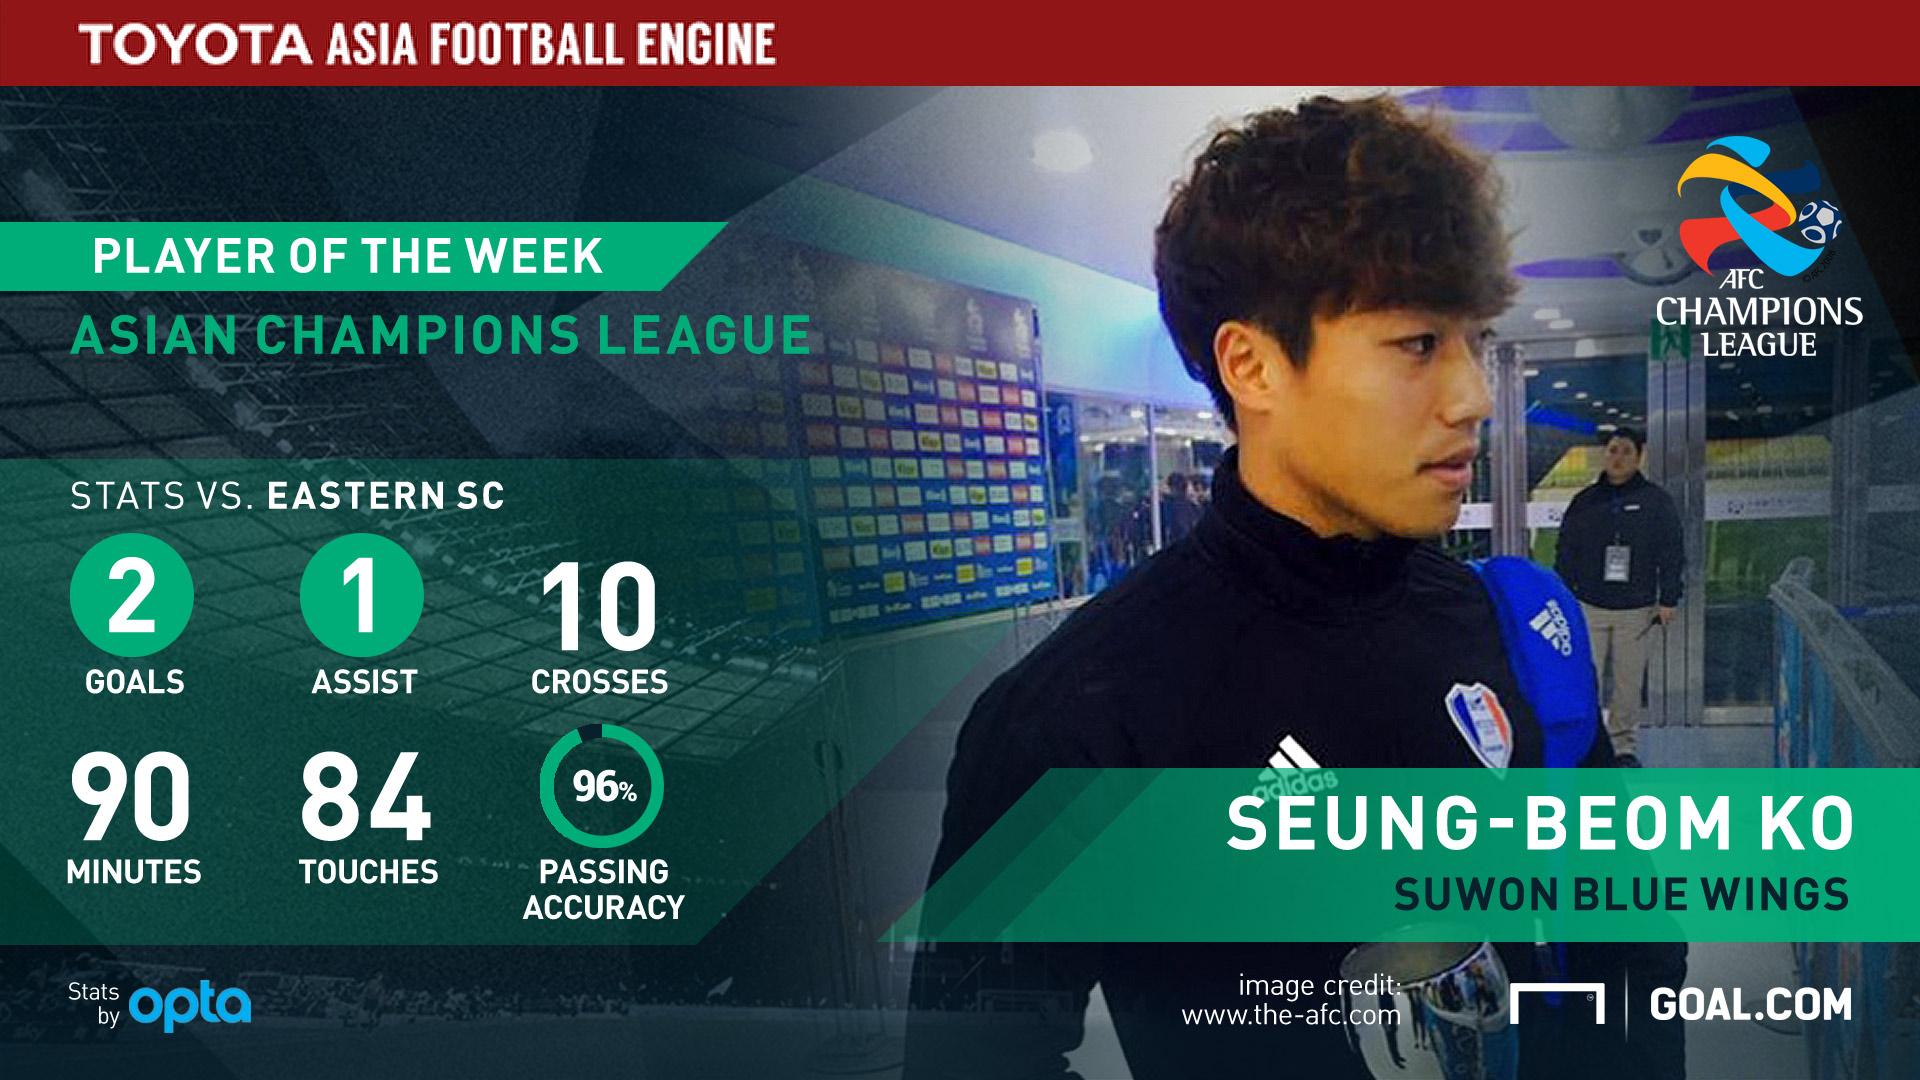 Ko Seung-Beom stats